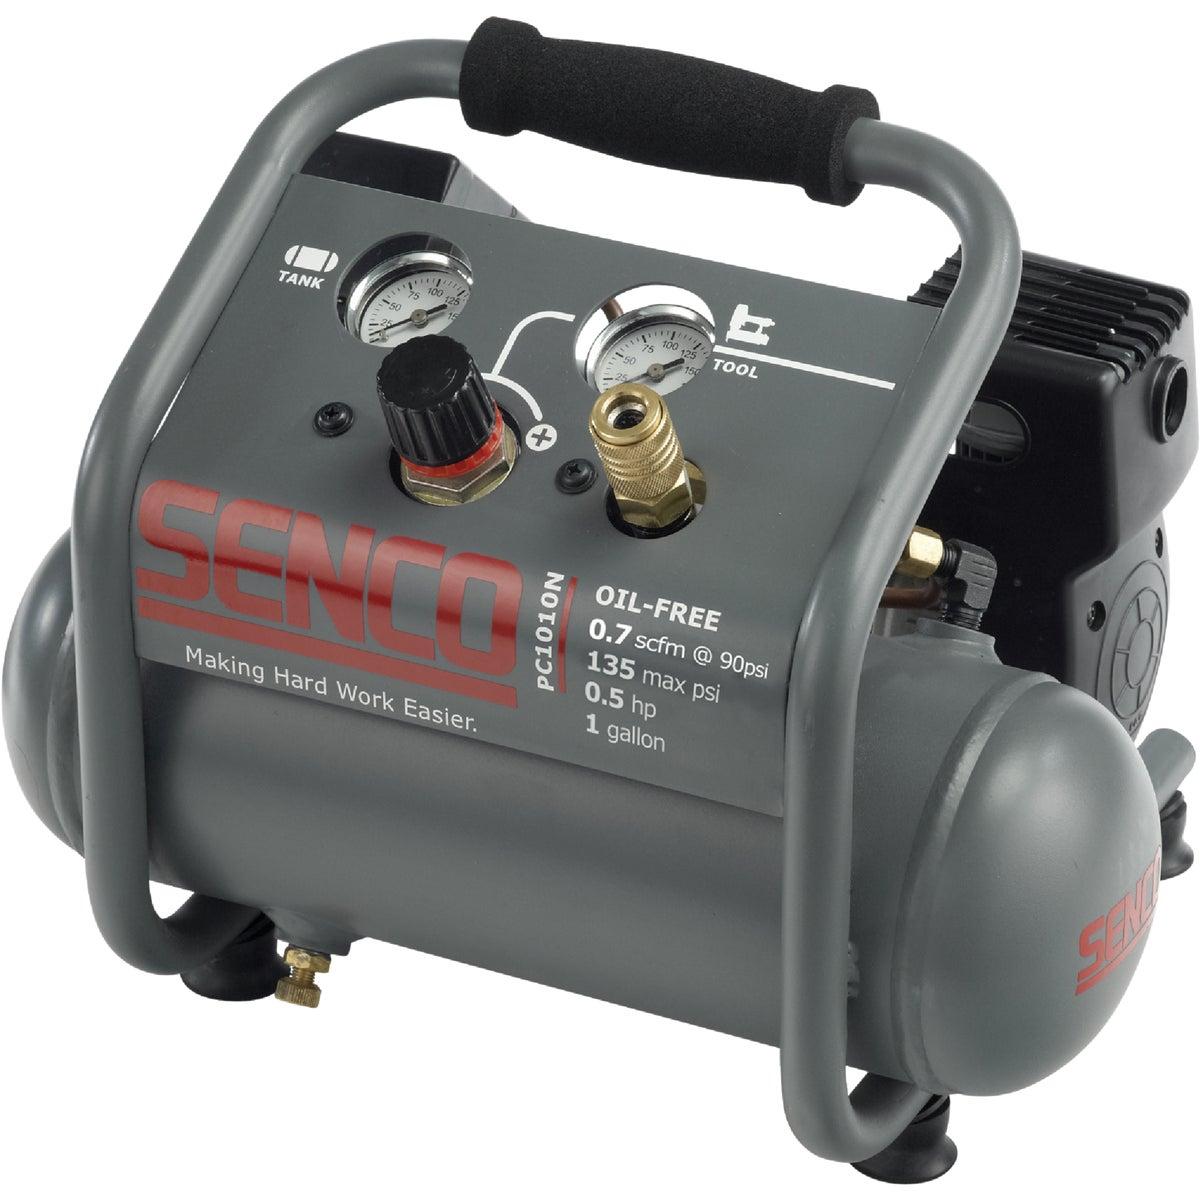 1 Gal Air Compressor